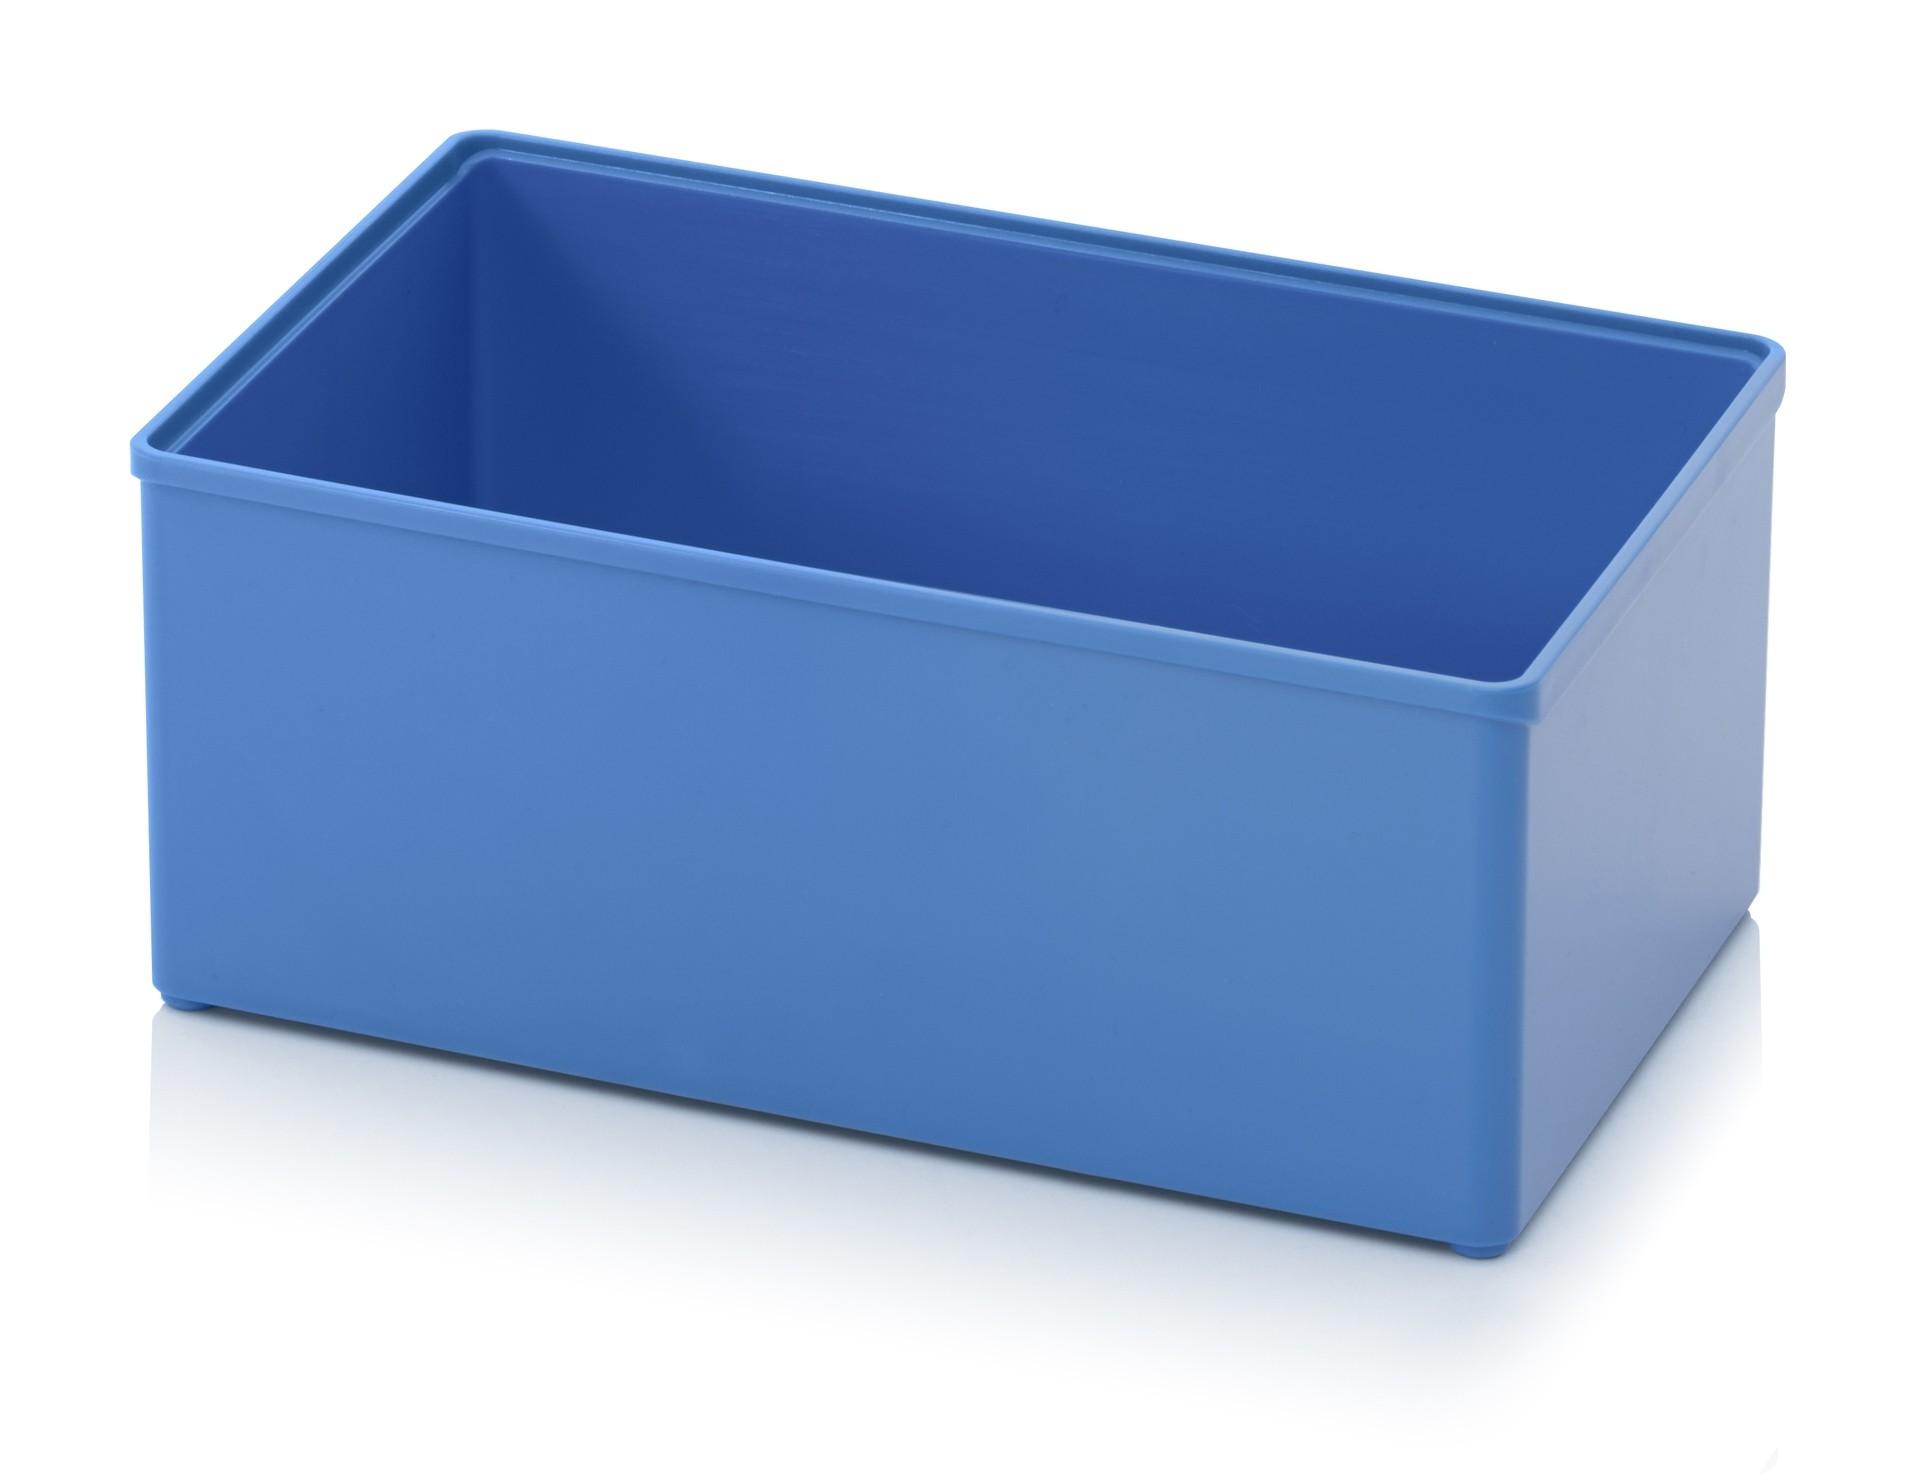 Toolbox 2 x 3 bin